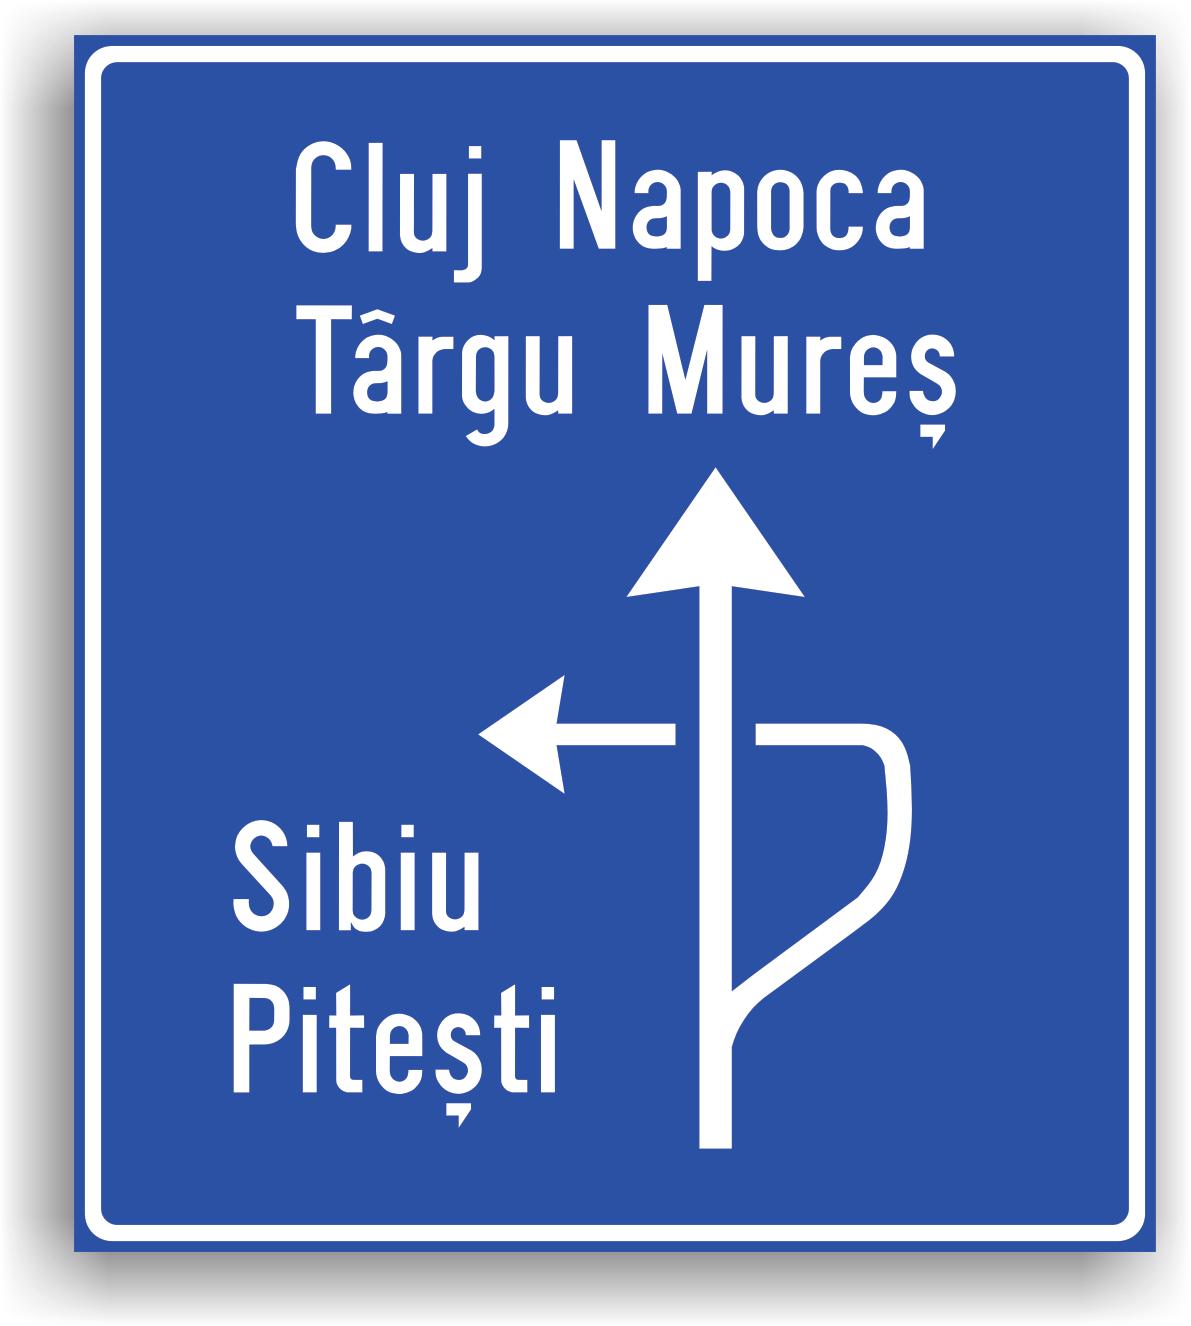 Presemnalizarea directiilor la o intersectie denivelata de drumuri